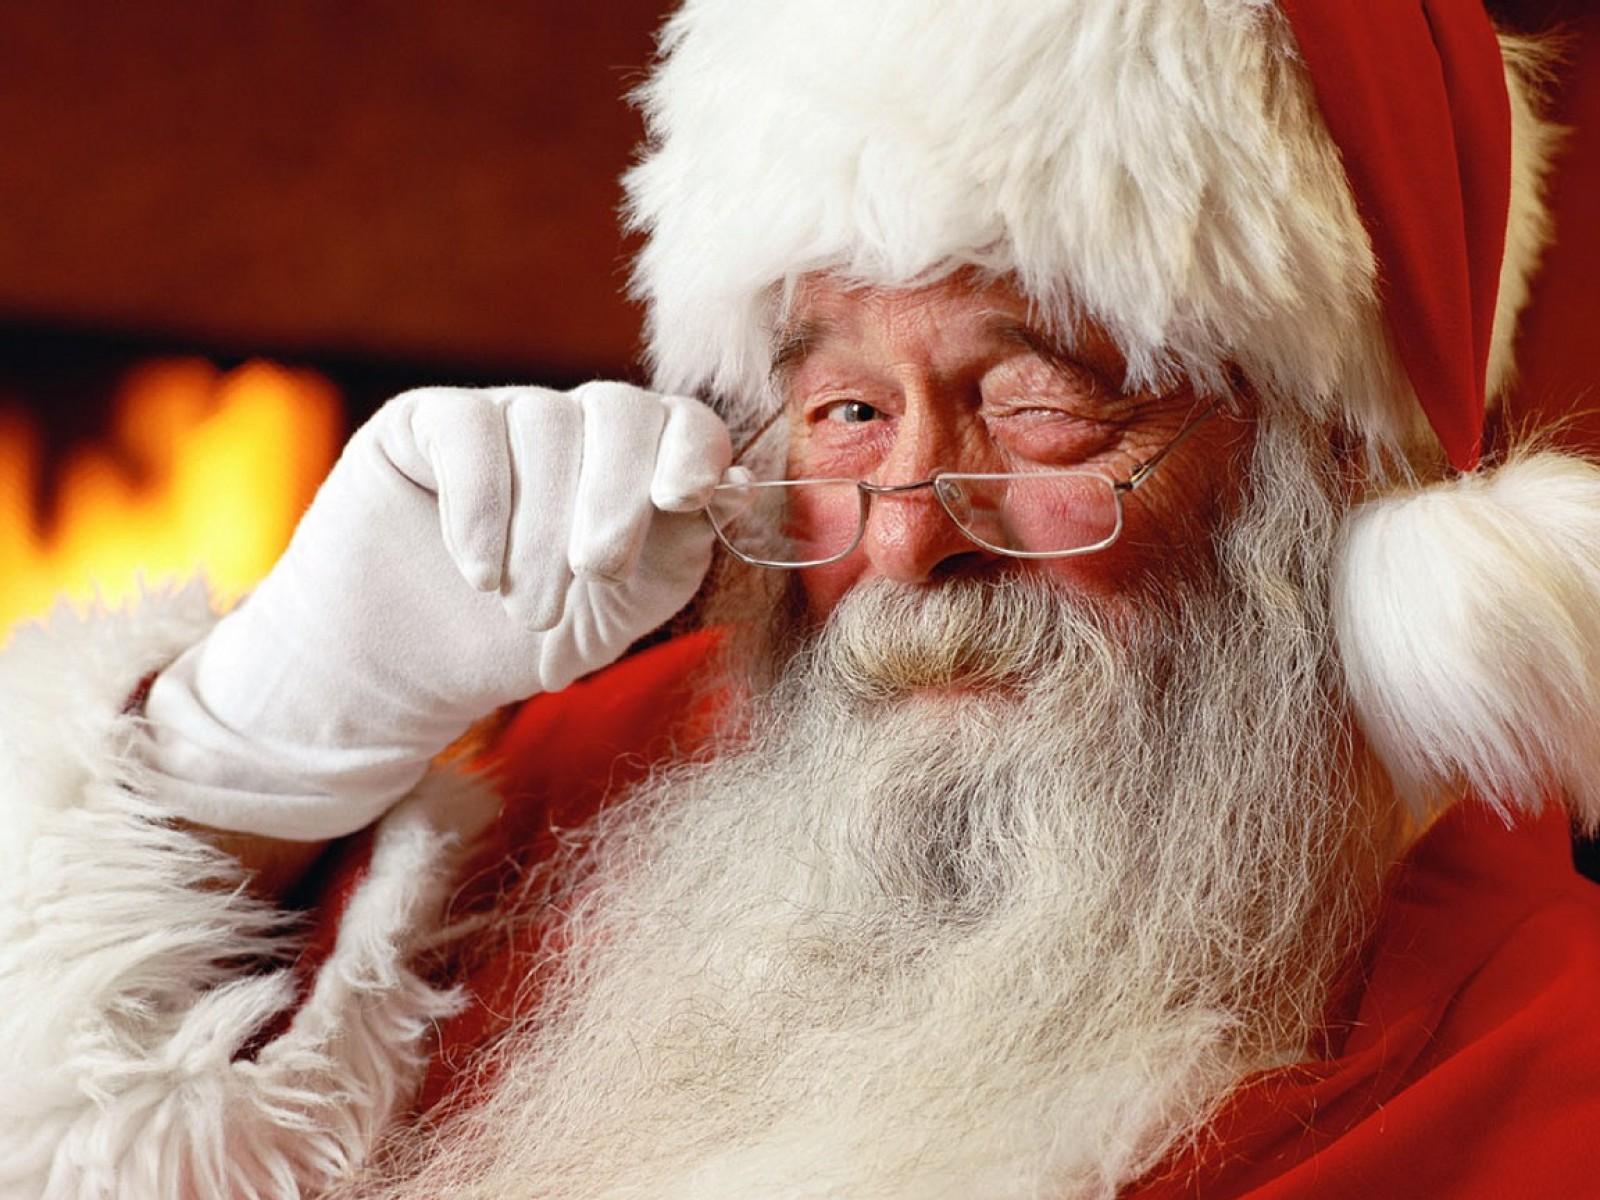 North Charleston Christmas Festival and Parade 2013